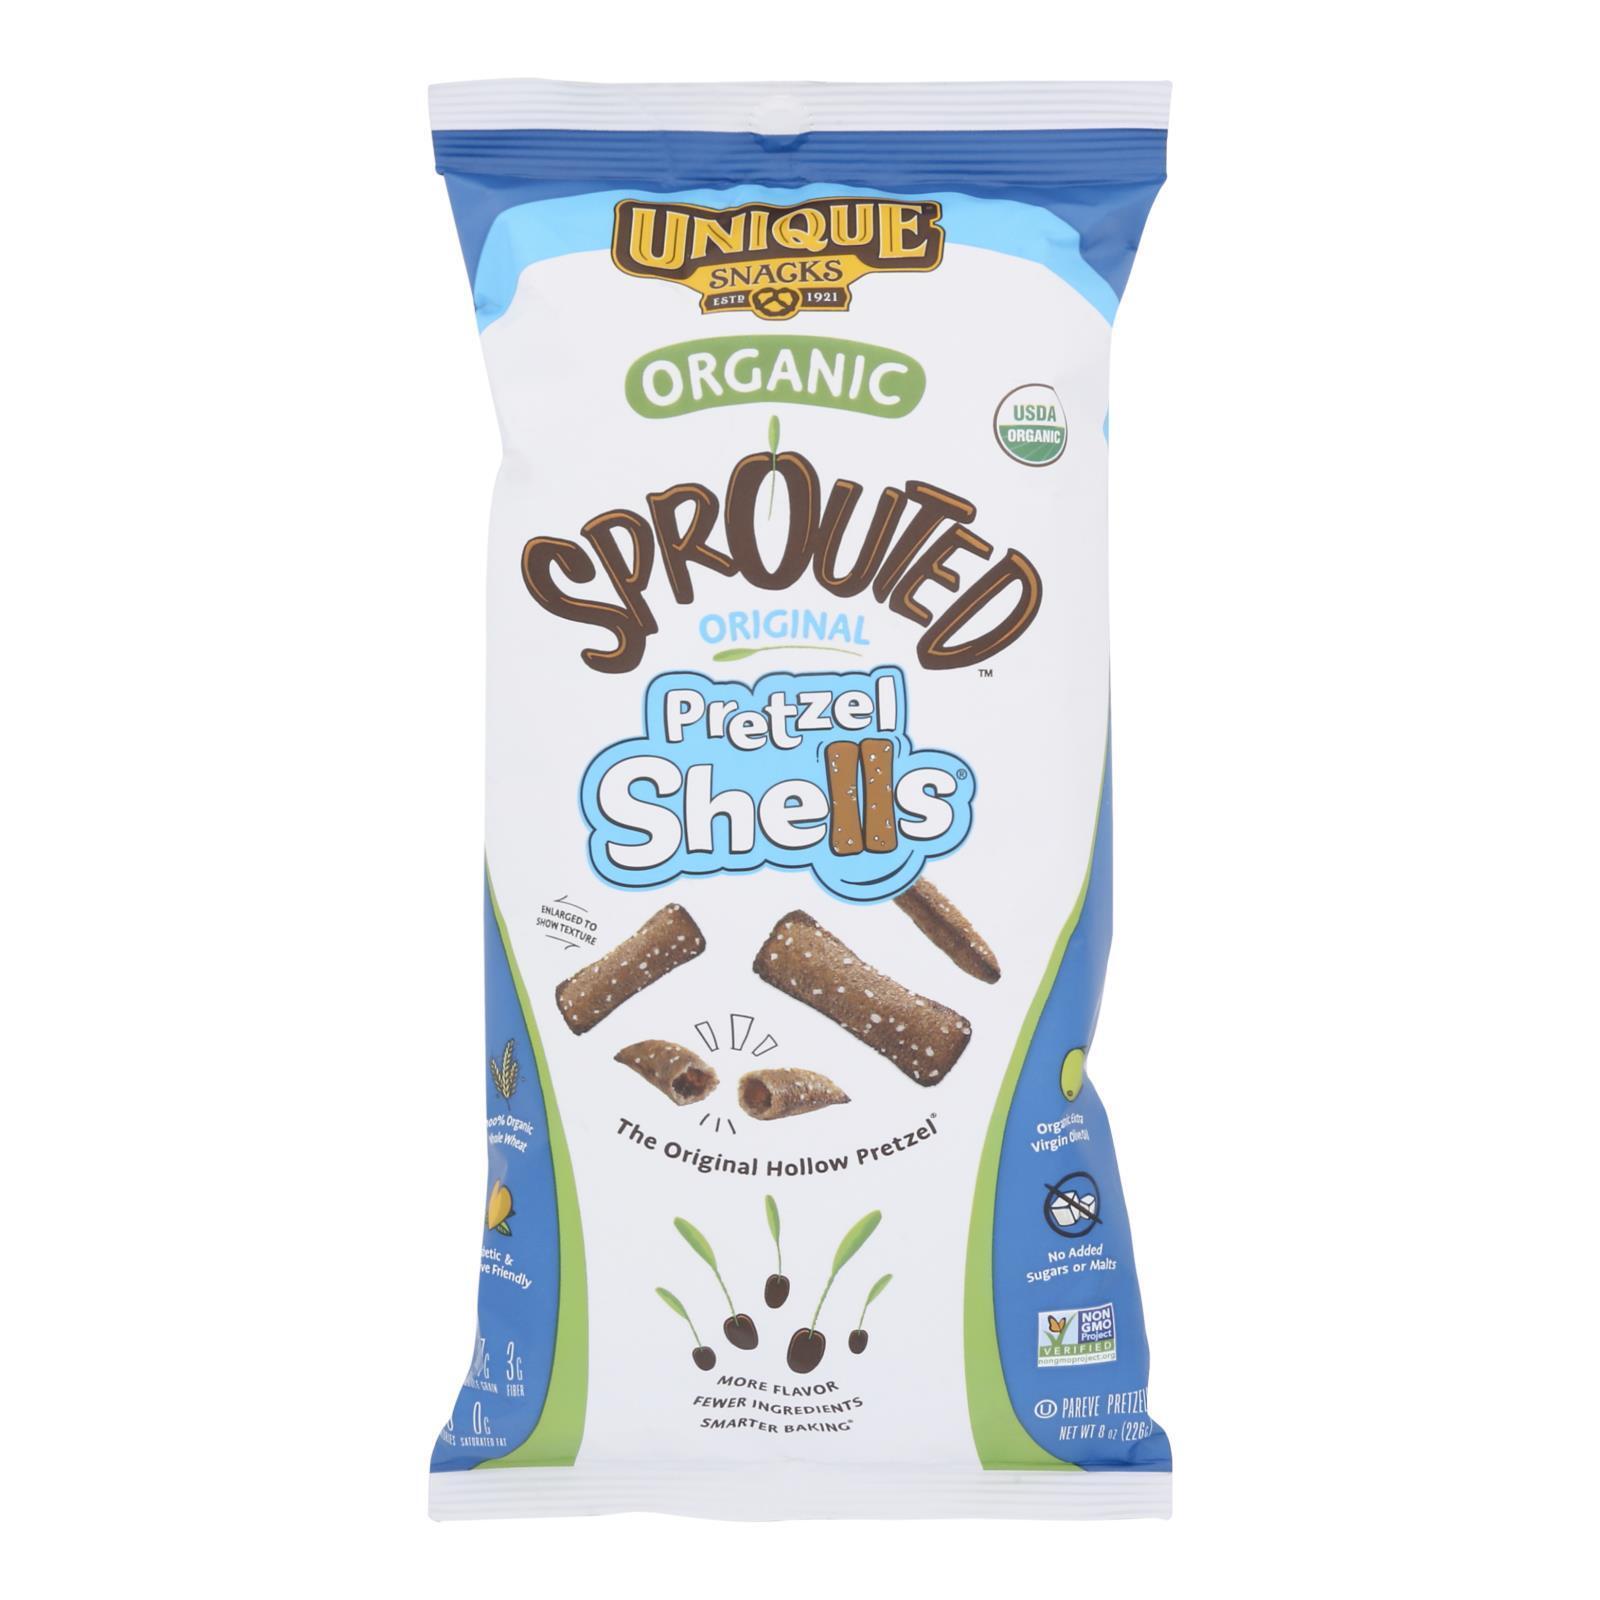 Unique Pretzels Sprouted Shells - Original Sea Salt - Case of 12 - 8 oz.